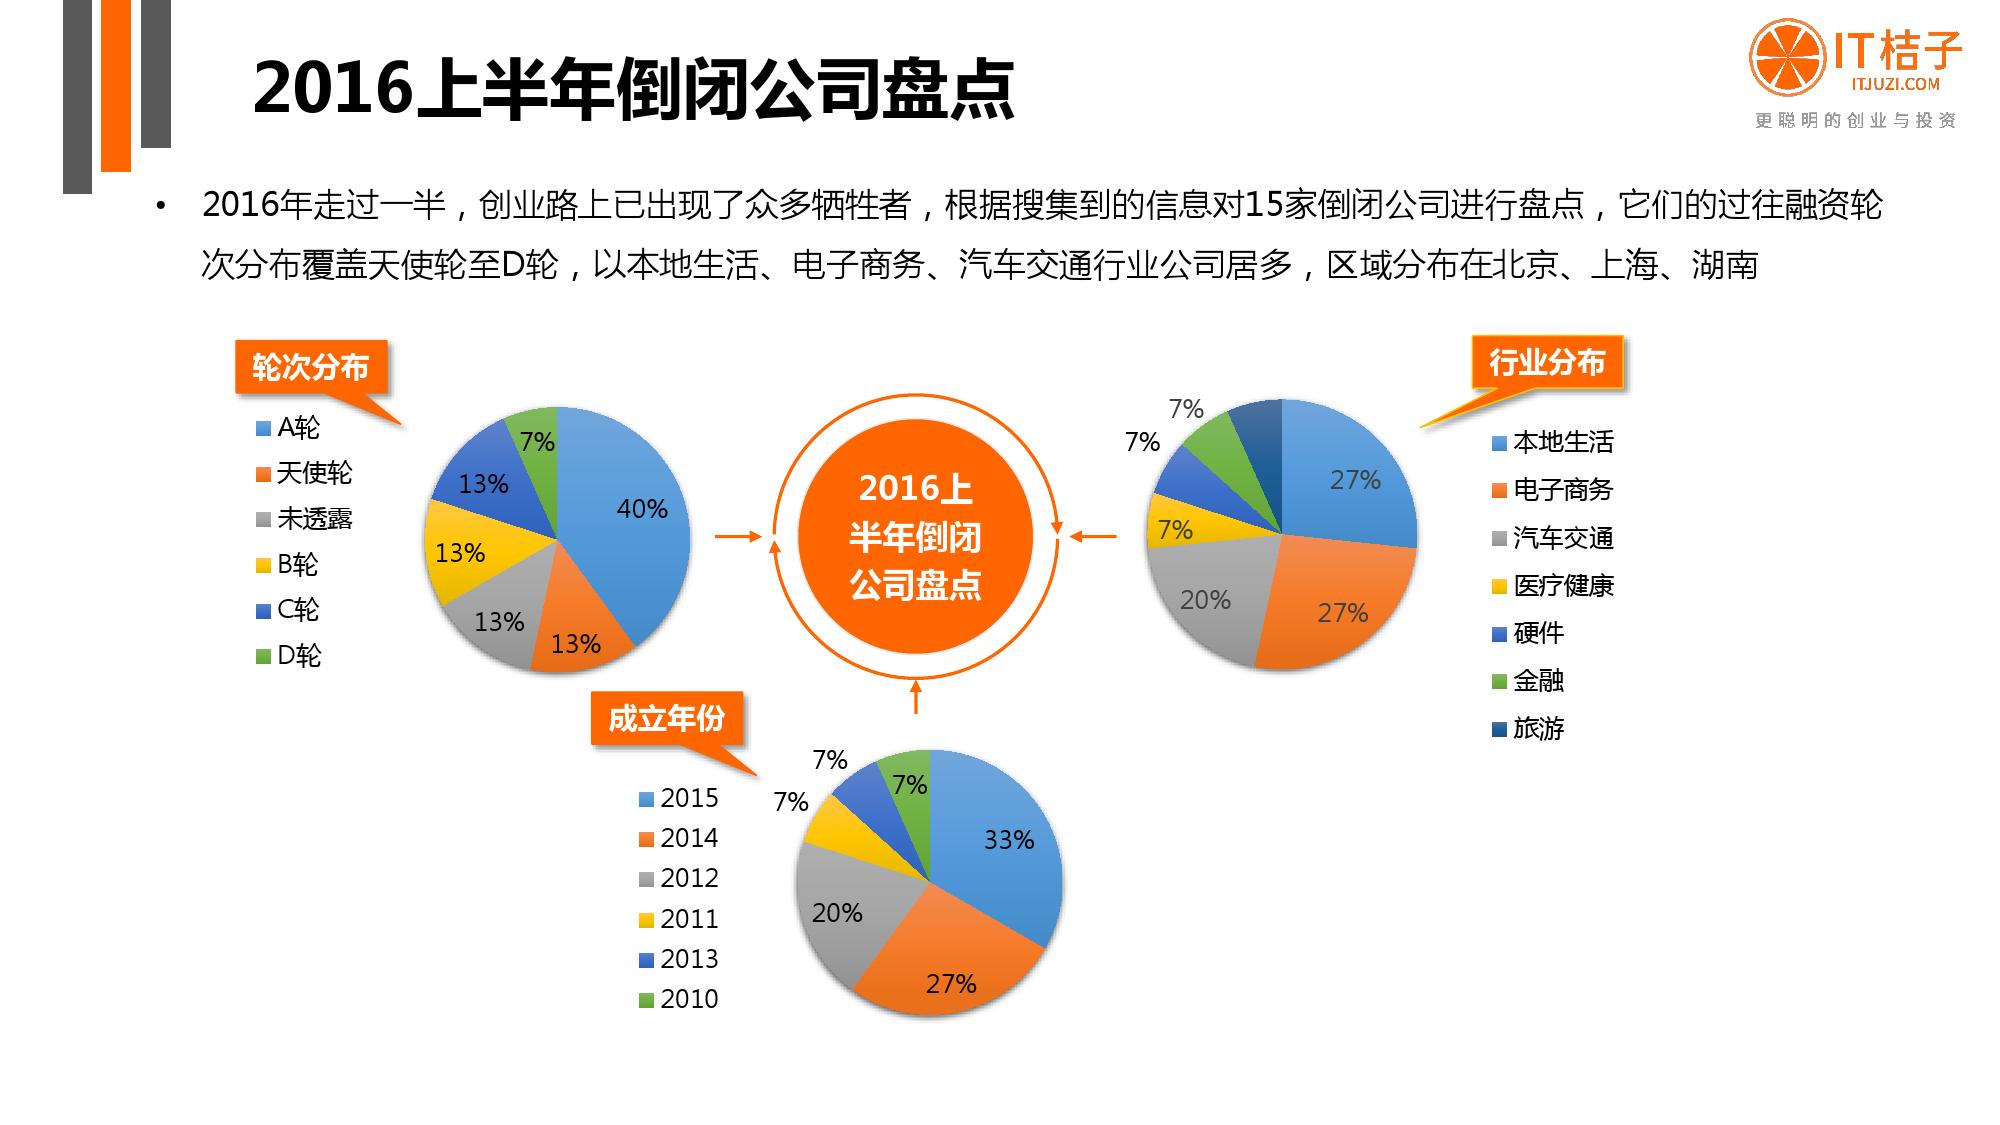 【IT桔子】2016年Q2中国互联网创业投资分析报告_000057